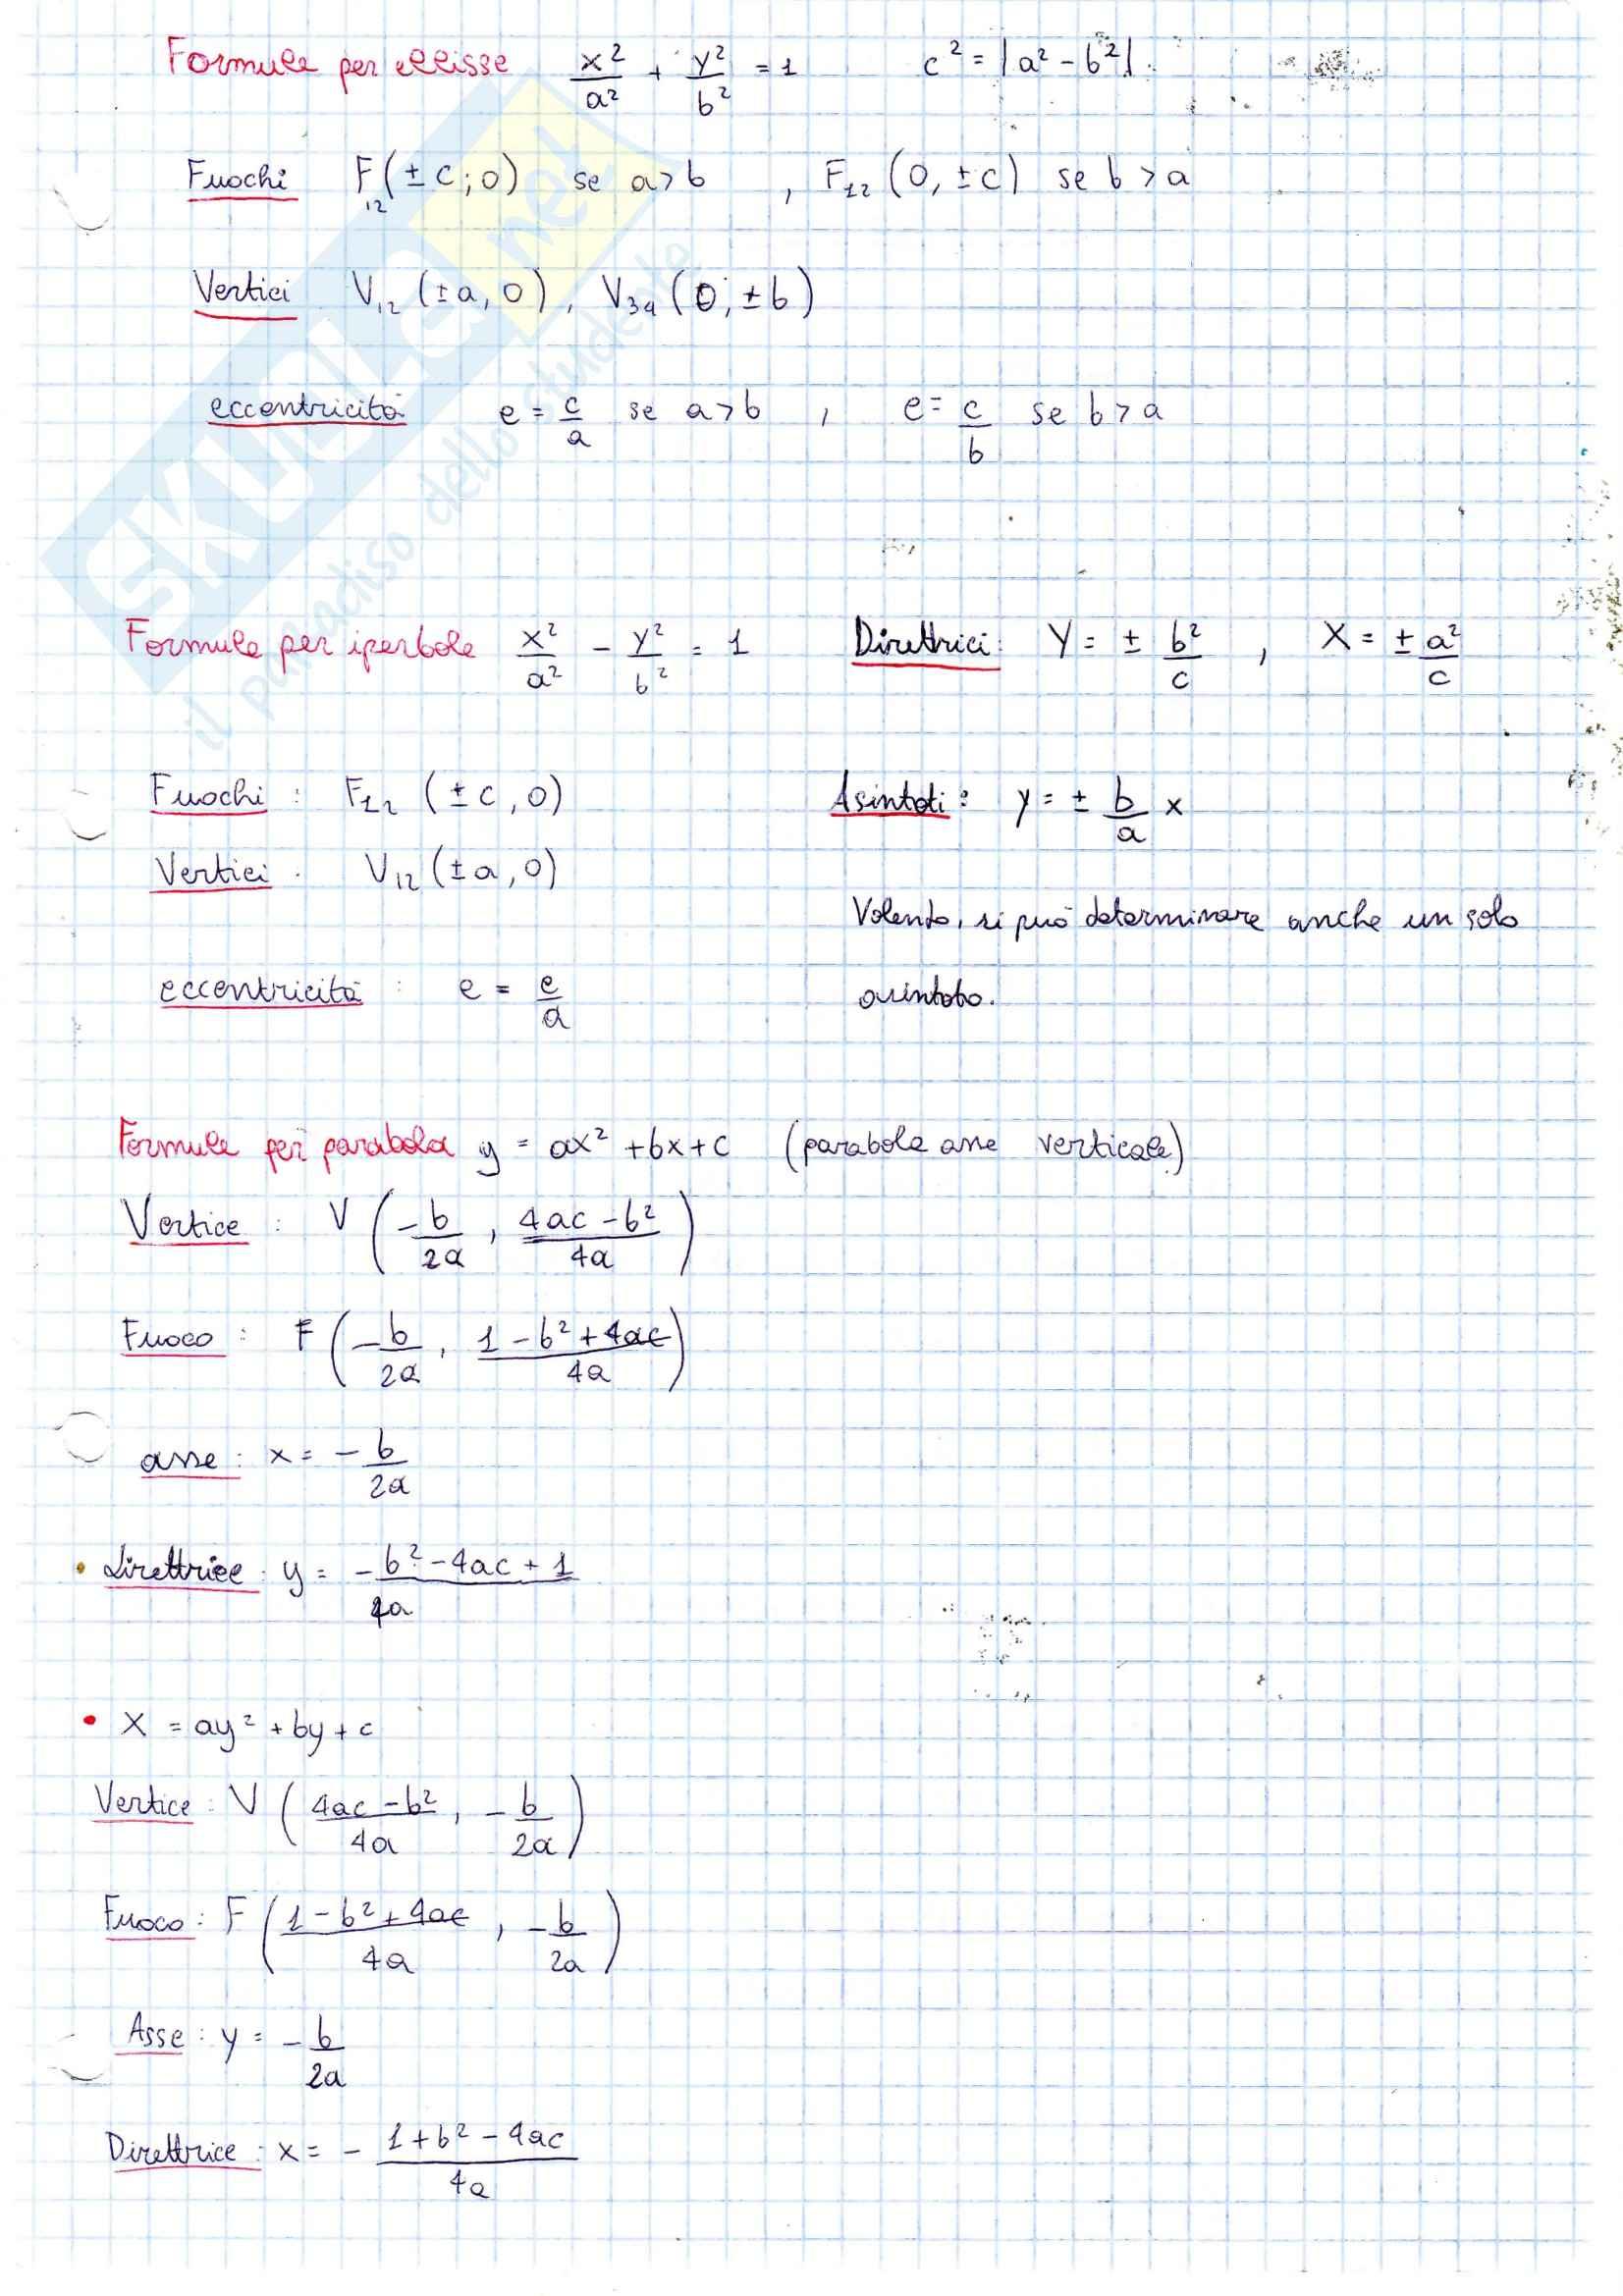 Geometria e algebra  - formule per l'ellisse, per l'Iperbole e per la parabola